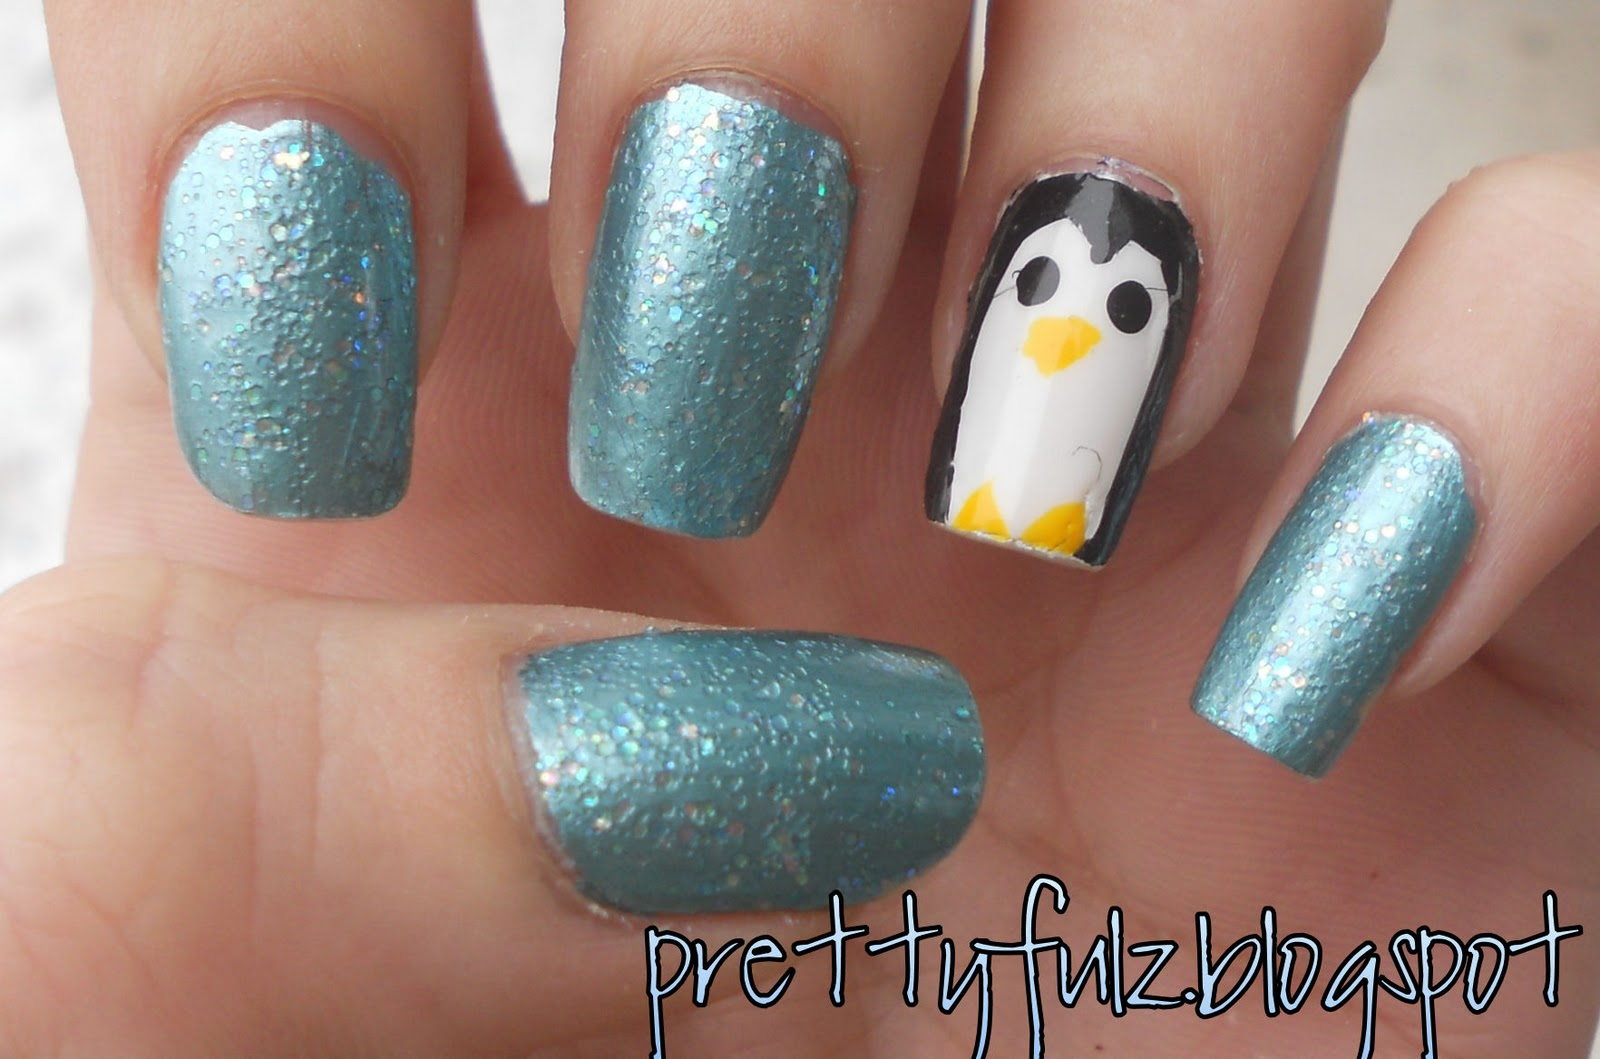 Prettyfulz: WINTER NAIL ART DESIGN | Penguin Nail Art Design